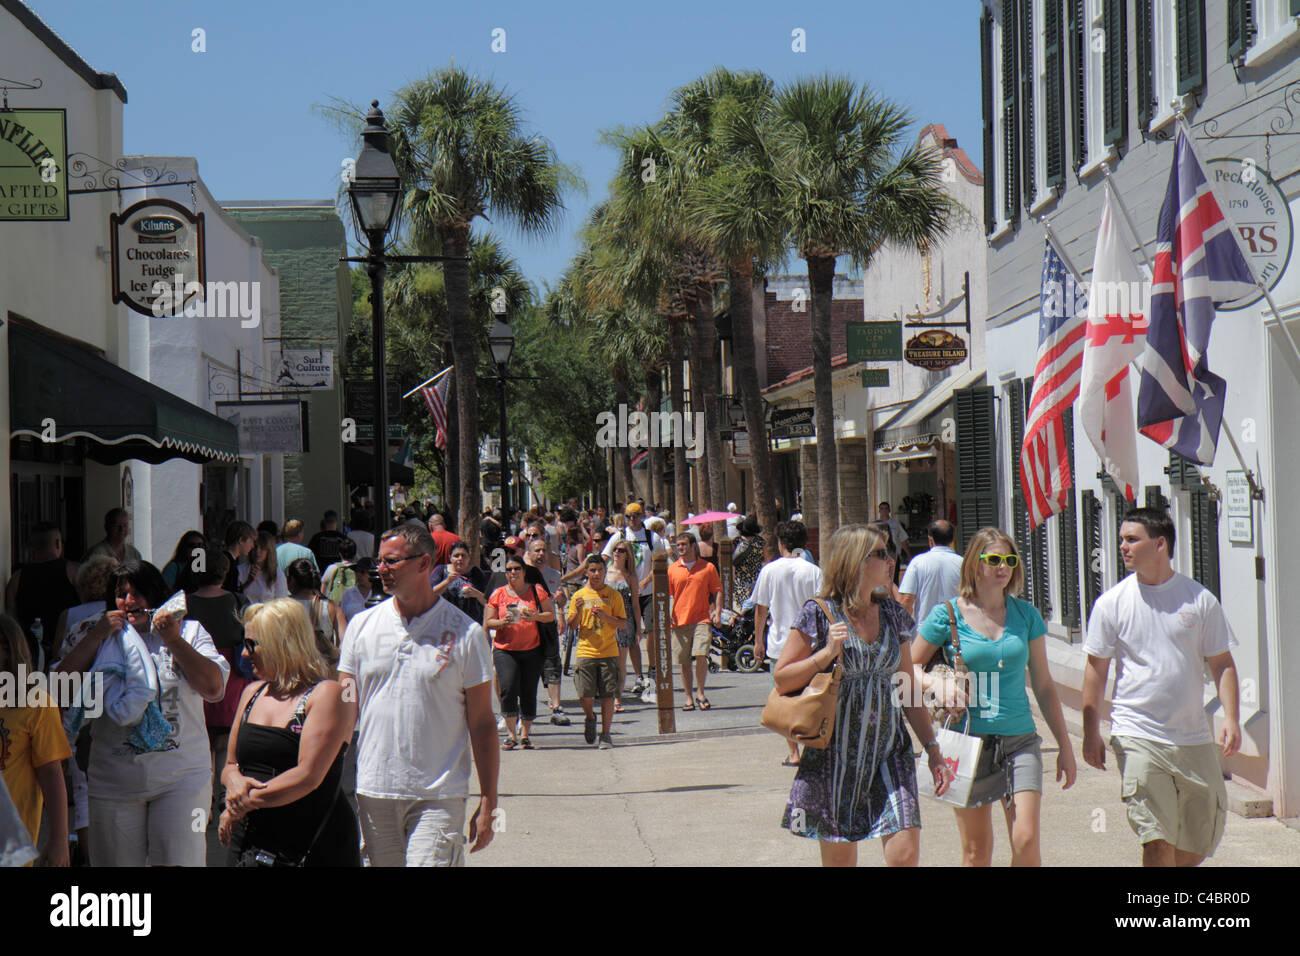 St. Saint Augustine Florida St. George Street Pedestrian Mall Shopping  Dining Walking Families